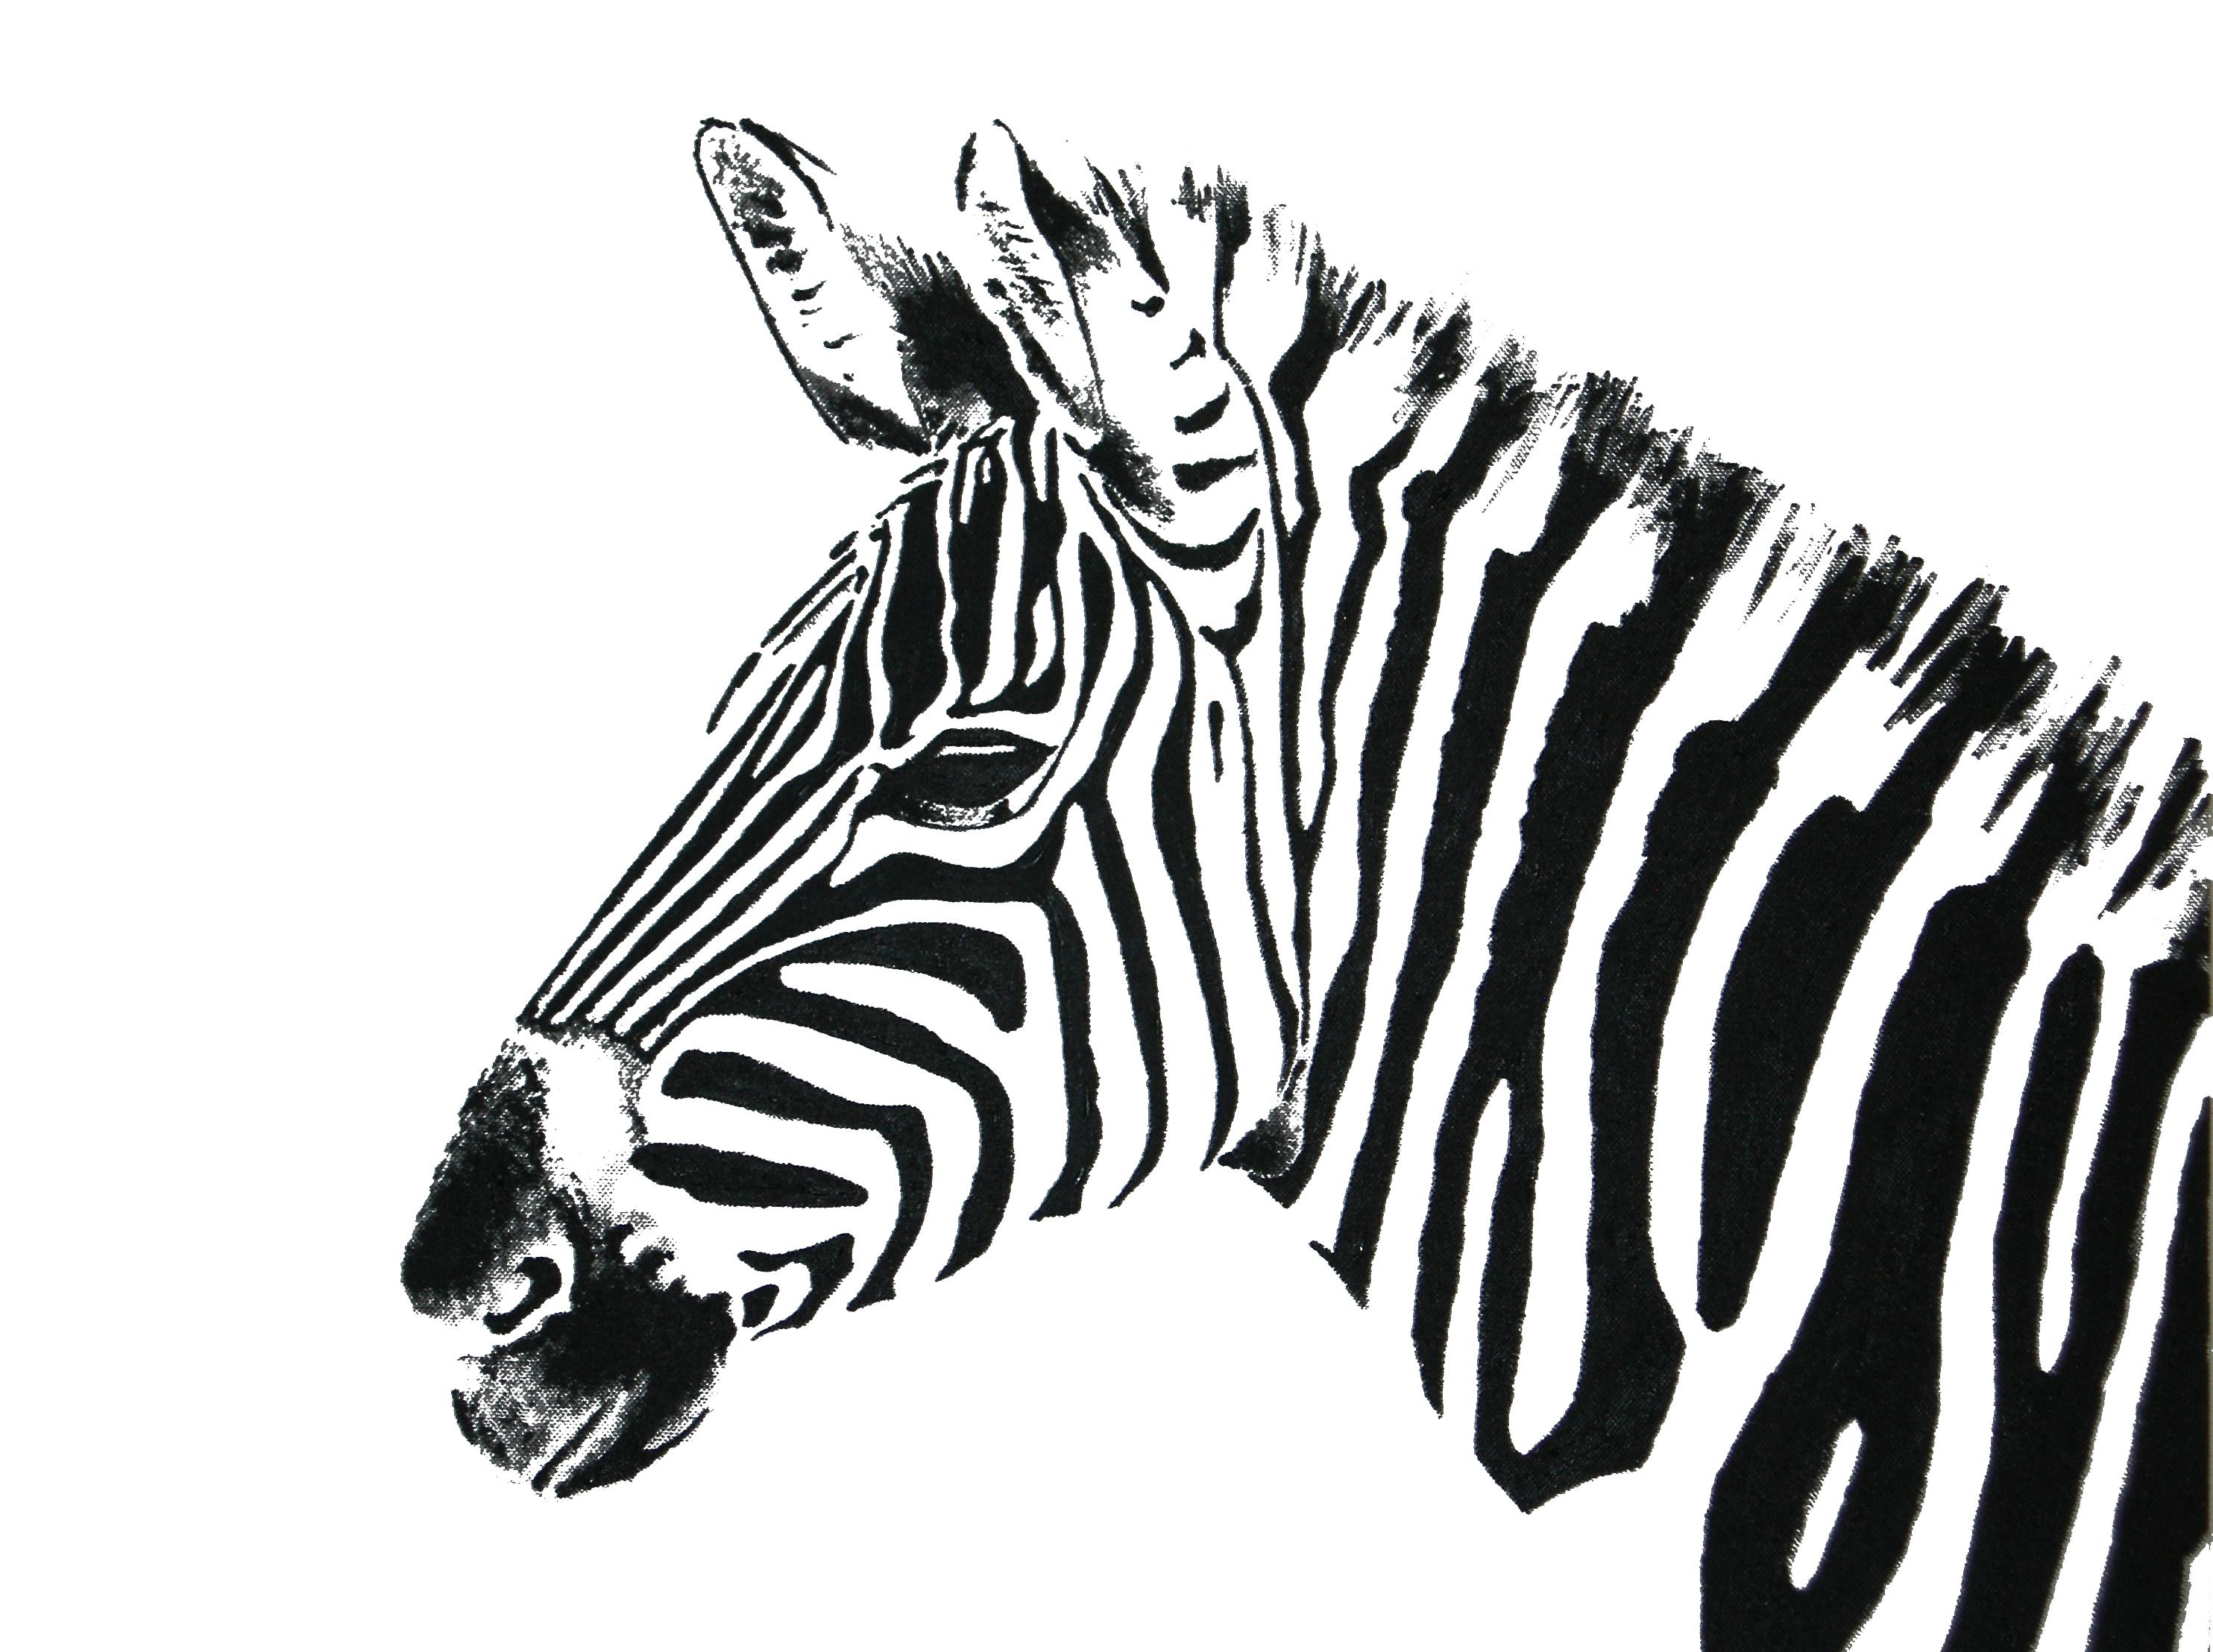 2968x2216 White Zebra.jpg